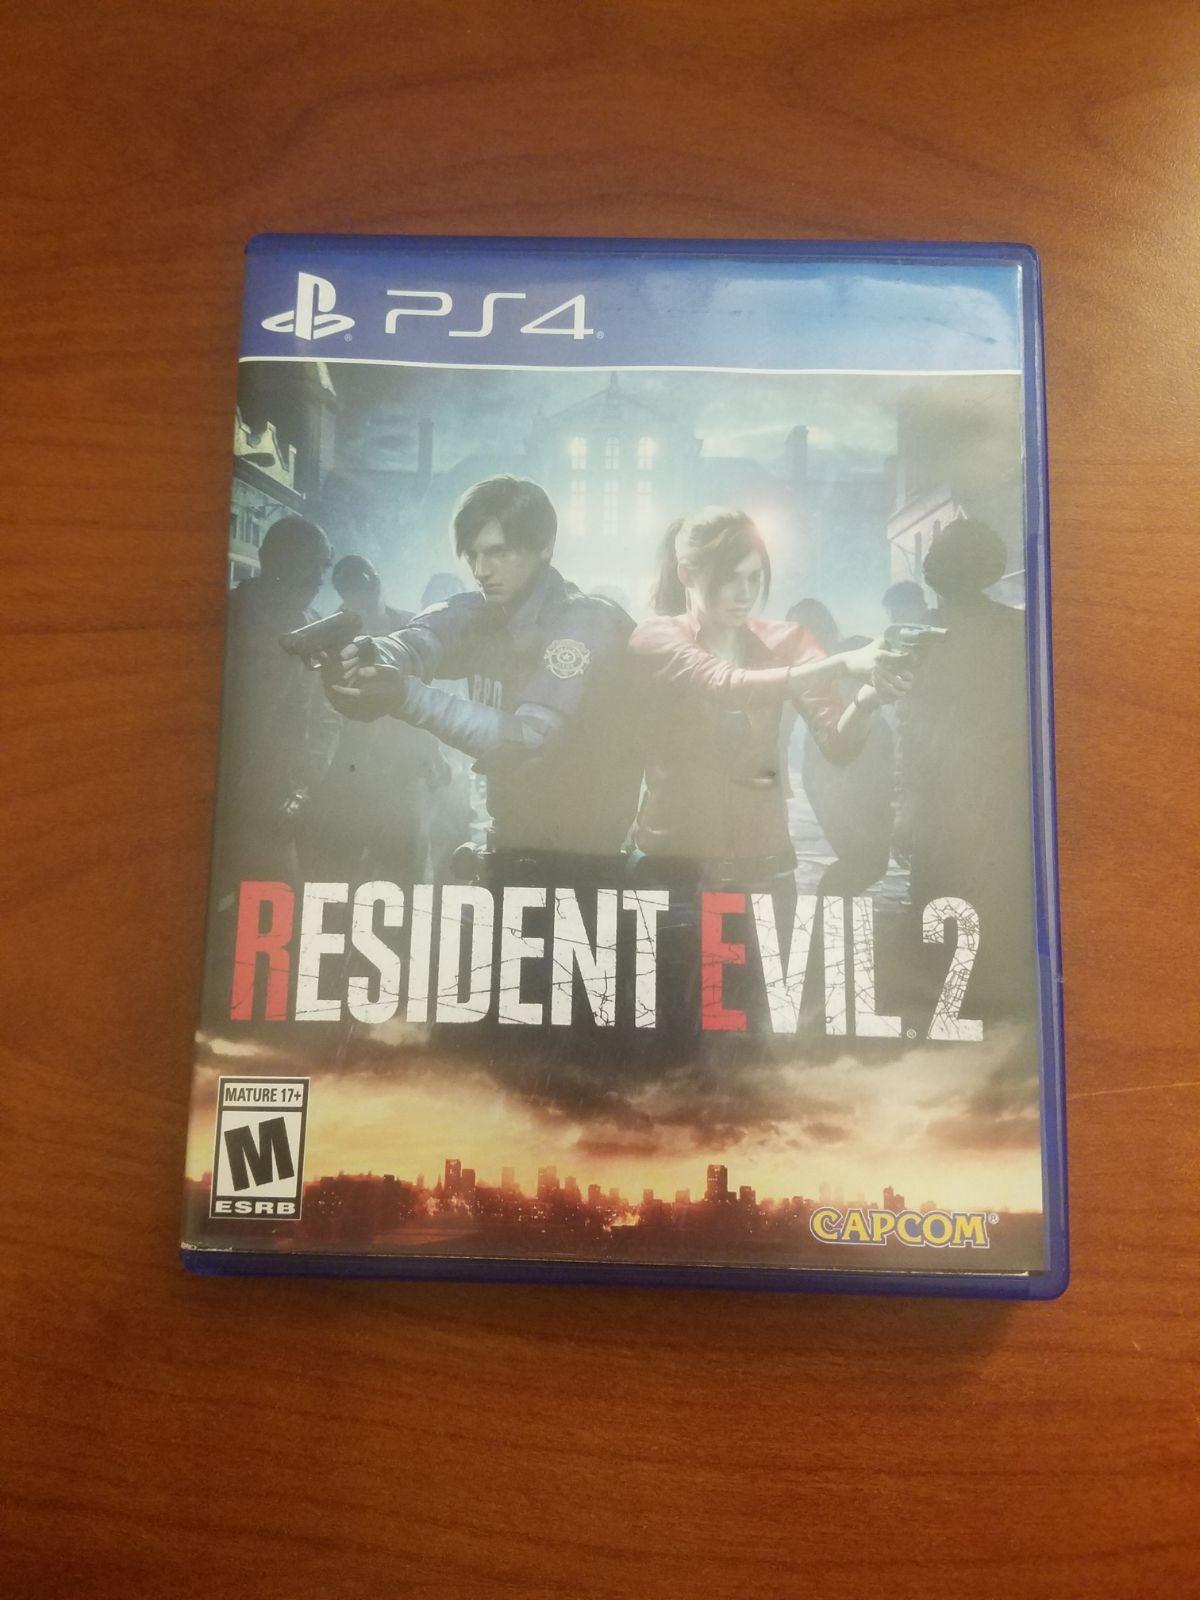 Resident Evil 2 (2019) on Playstation 4